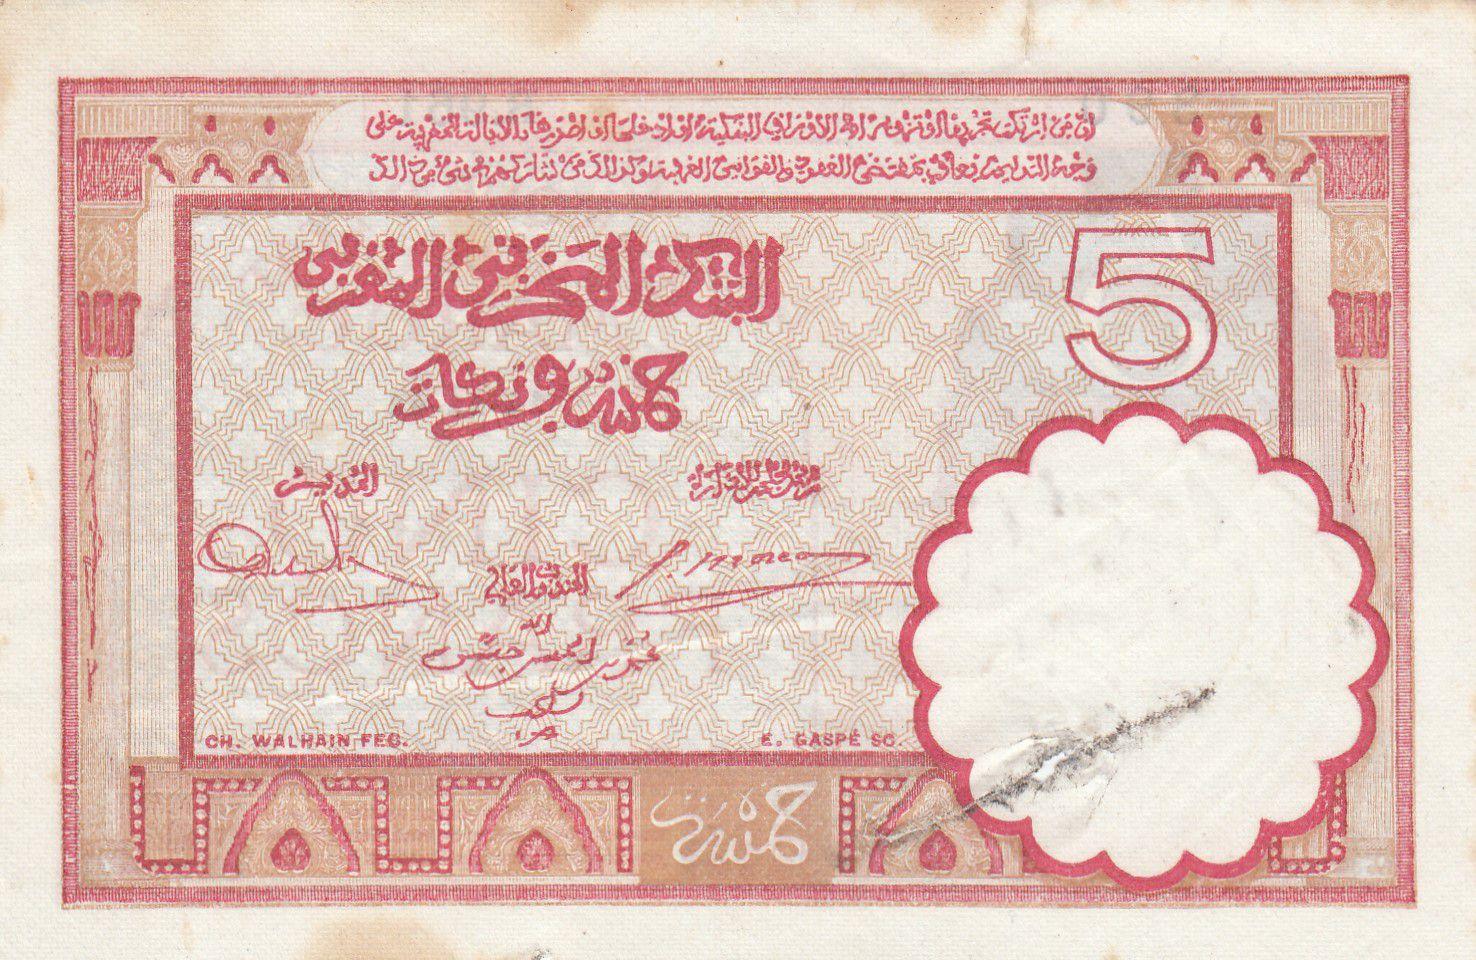 Maroc 5 Francs 14-11-1941 - TB - Série R.961 - P.23Ab